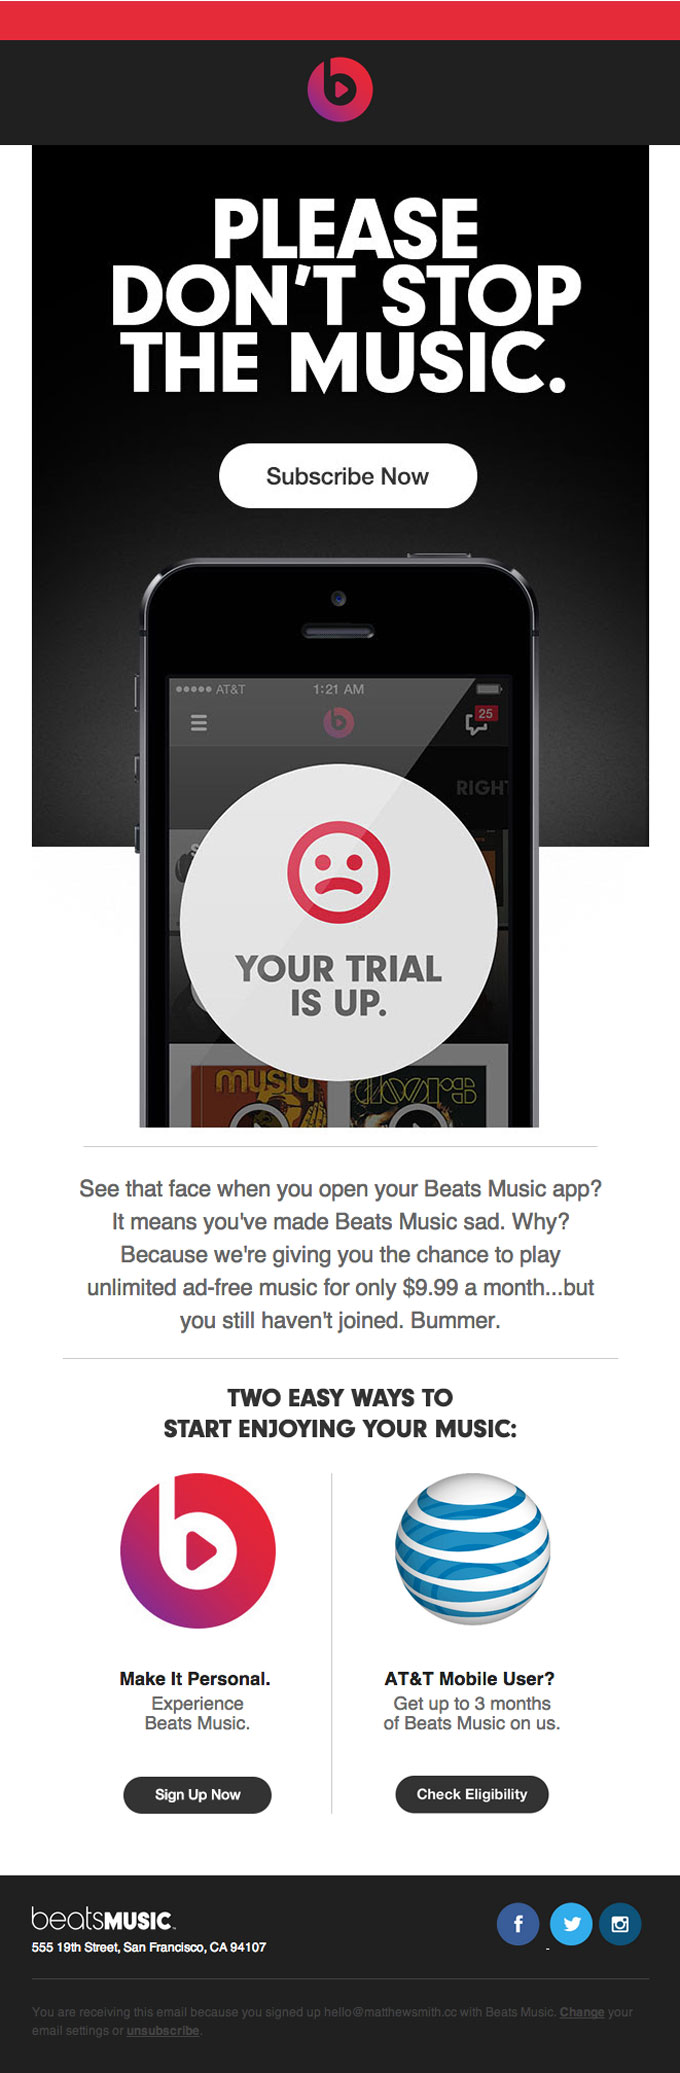 Customer-Retention-Email-Design-from-Beats-Music.jpg